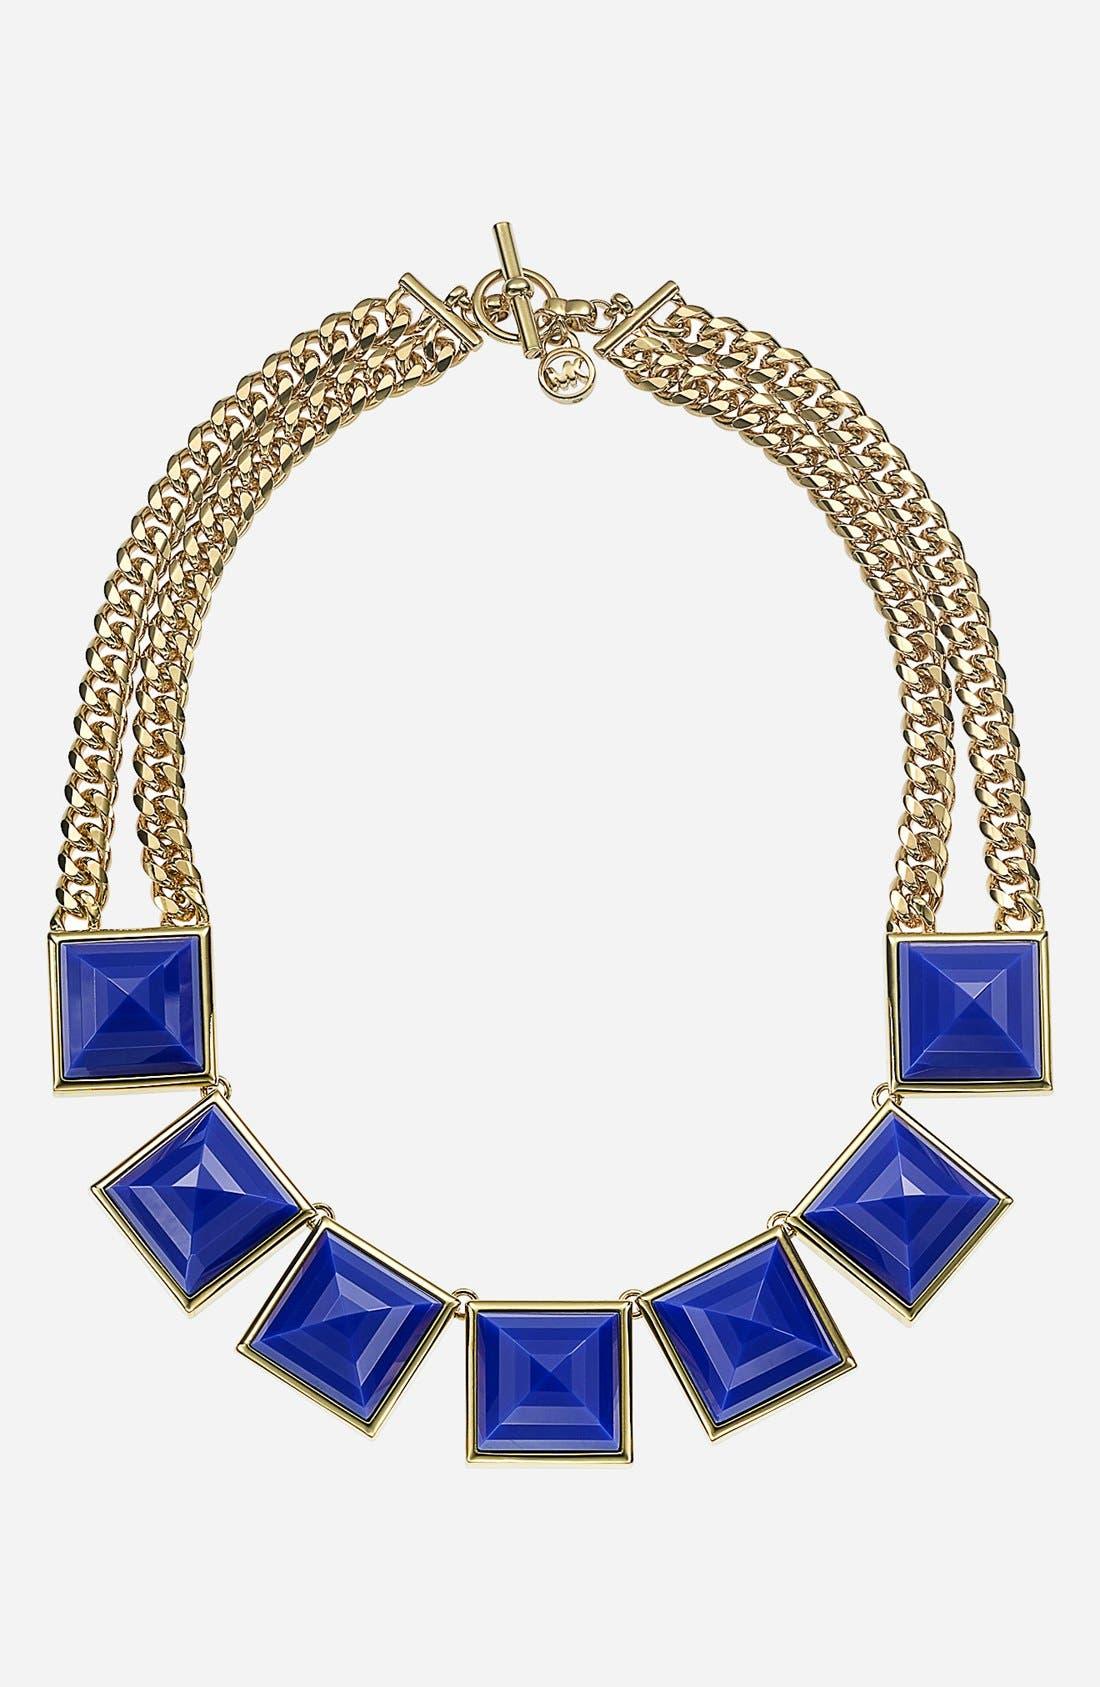 Alternate Image 1 Selected - Michael Kors 'Glam Rock' Collar Necklace